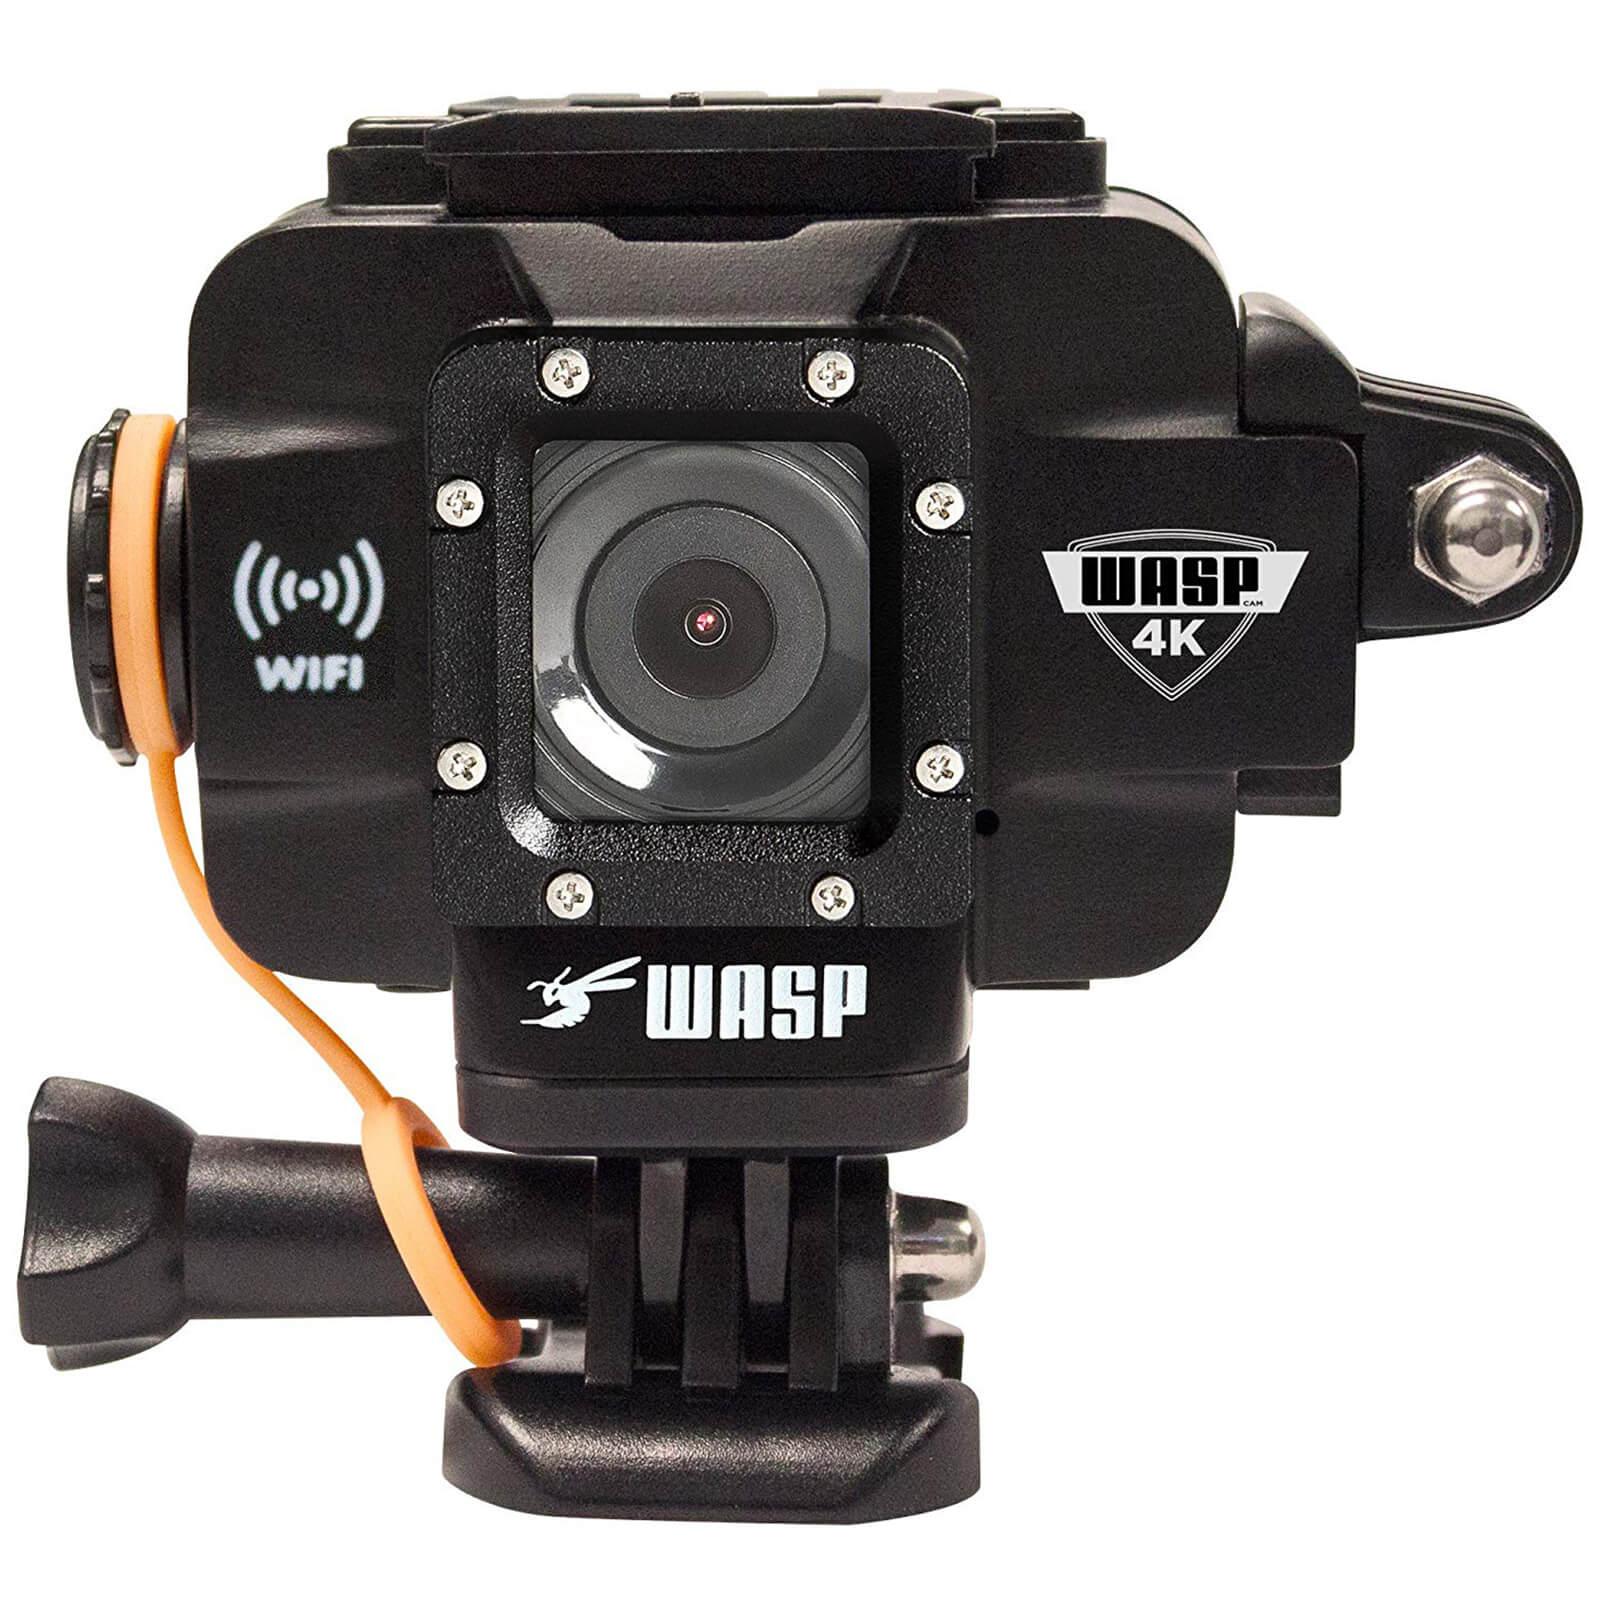 Waspcam 9907 4K Wi-Fi Waterproof Action Camera - Black £28.98 Delivered @ Zavvi